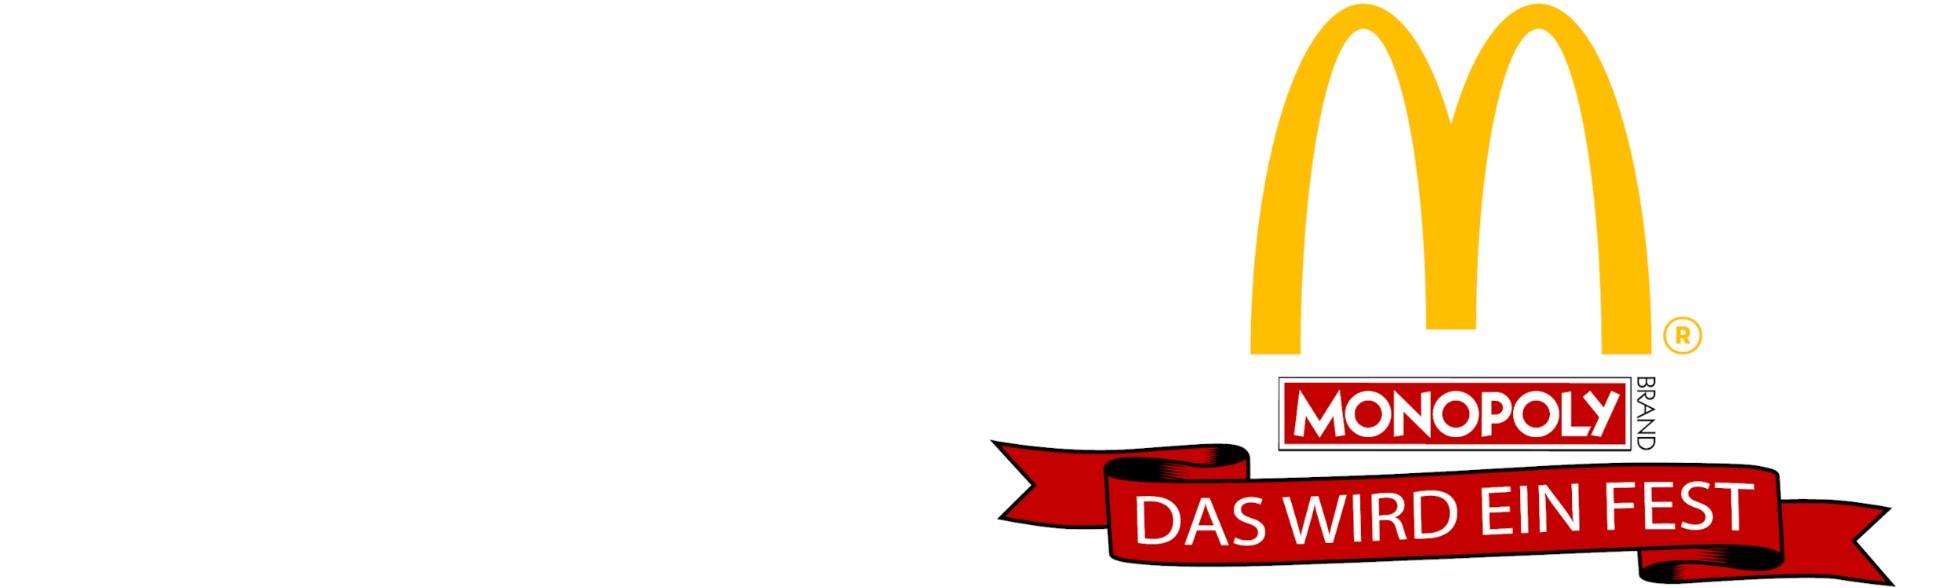 McDonald\'s Monopoly bei Mister Spex